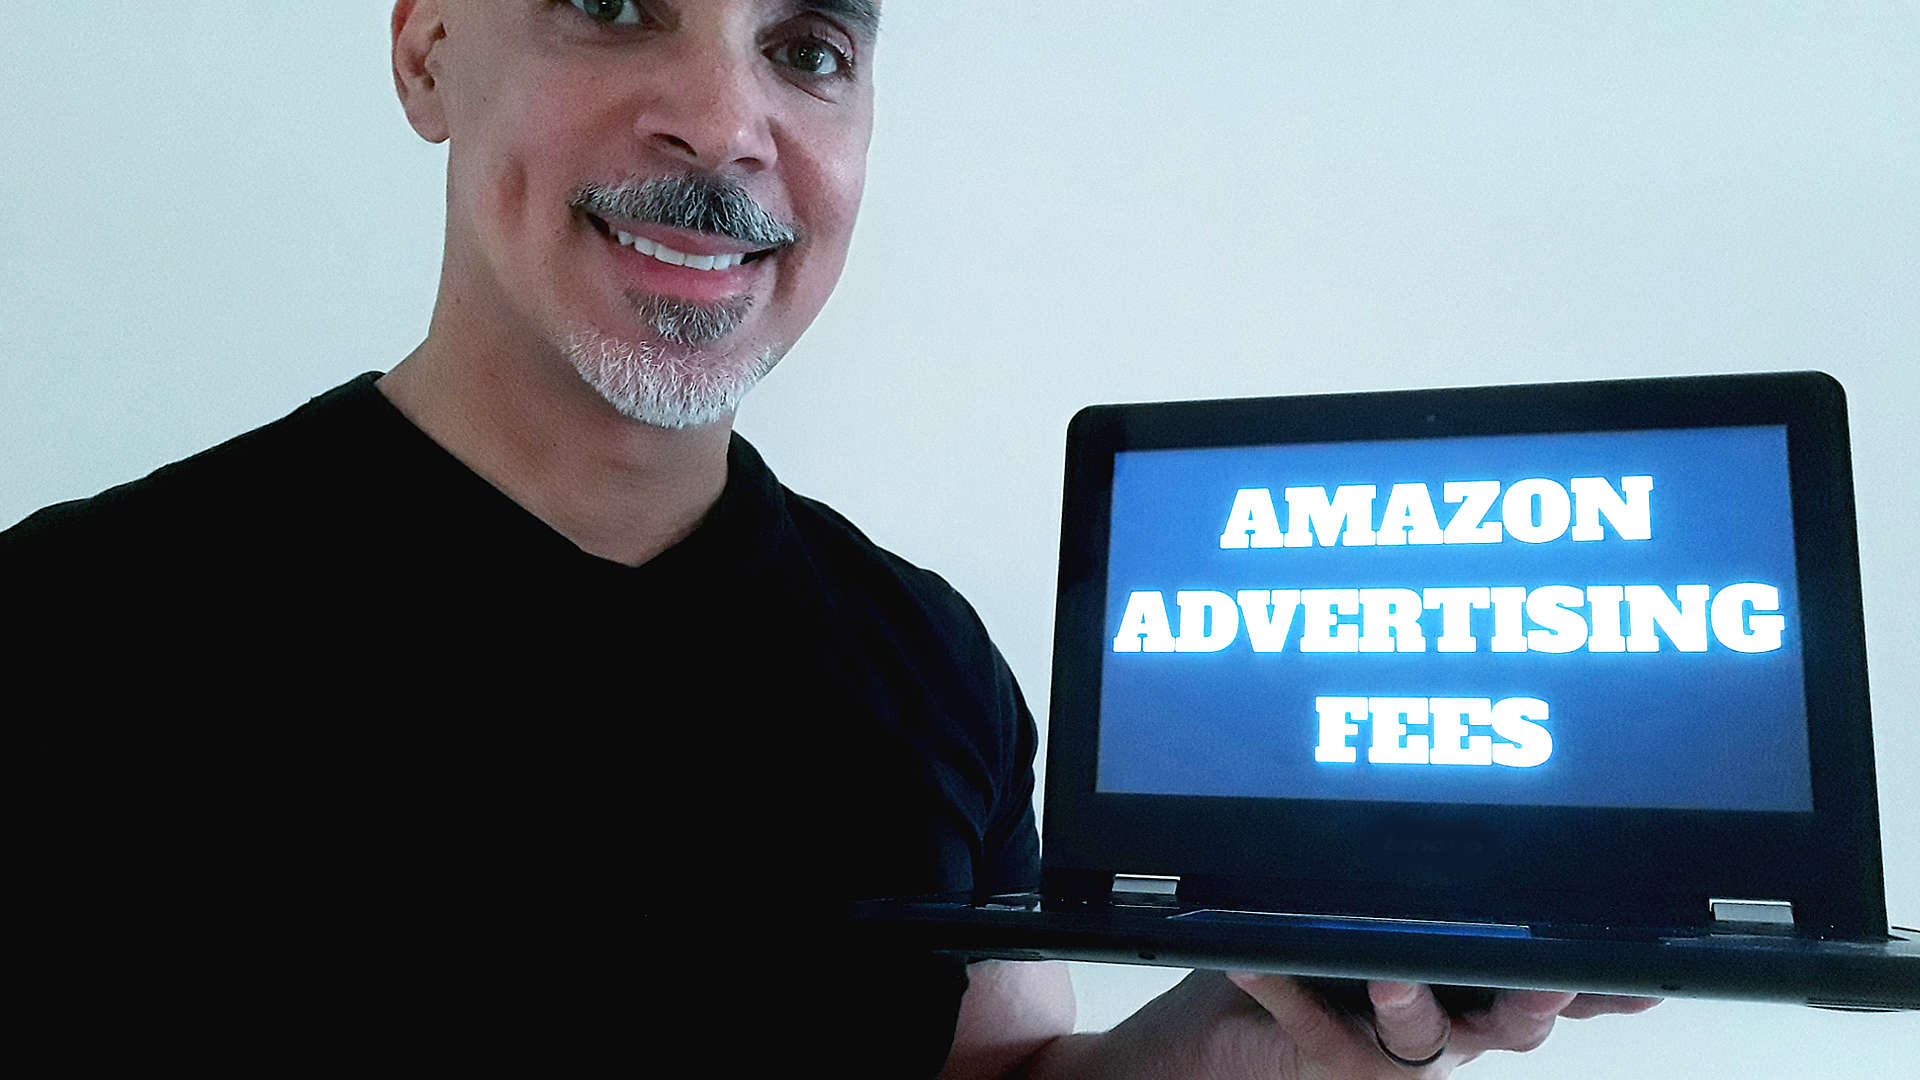 Amazon Advertising Fees